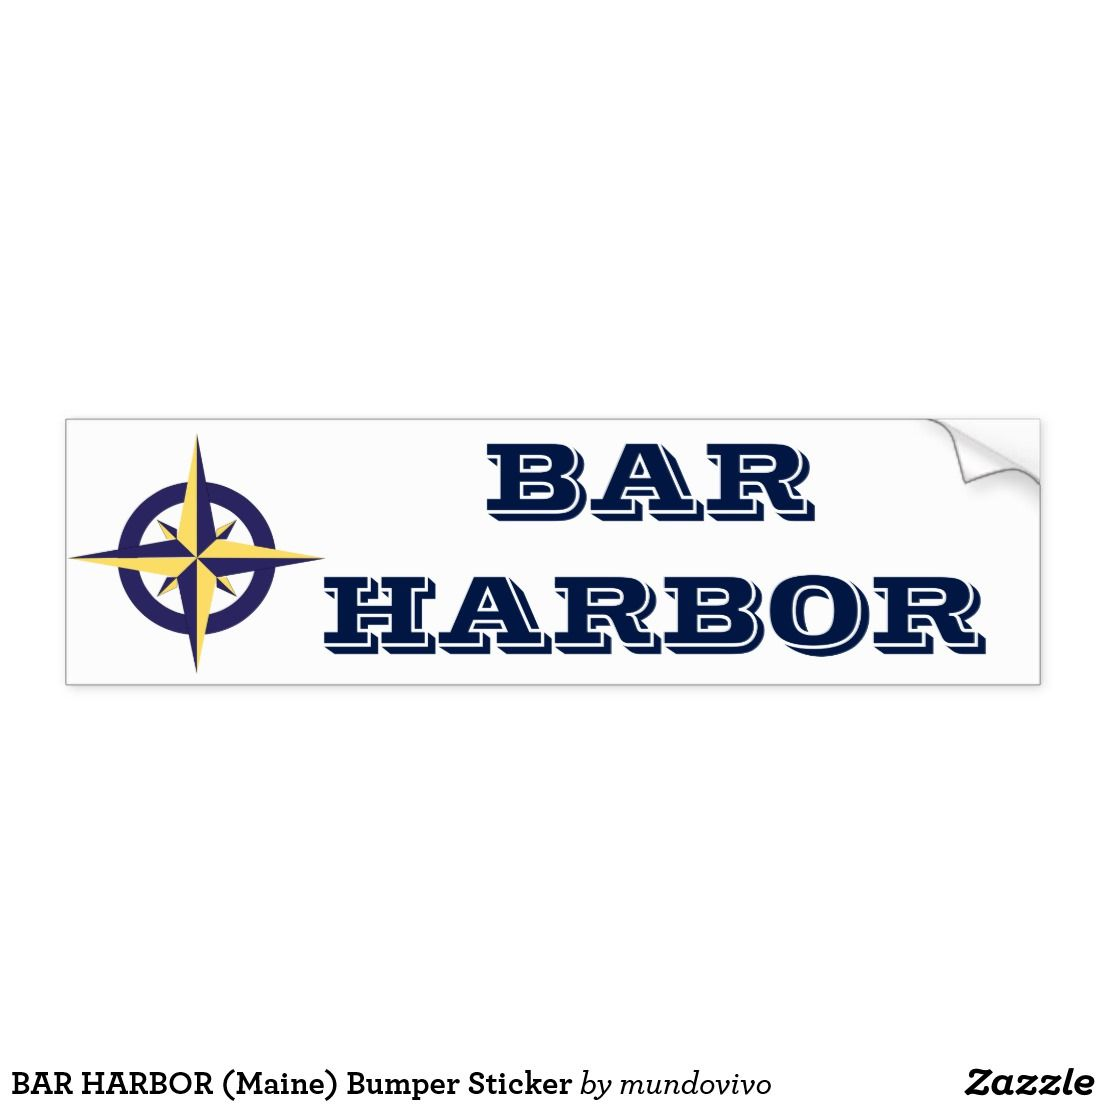 Bar Harbor Maine Bumper Sticker Zazzle Com Bumper Stickers Bar Harbor Maine Bar Harbor [ 1106 x 1106 Pixel ]